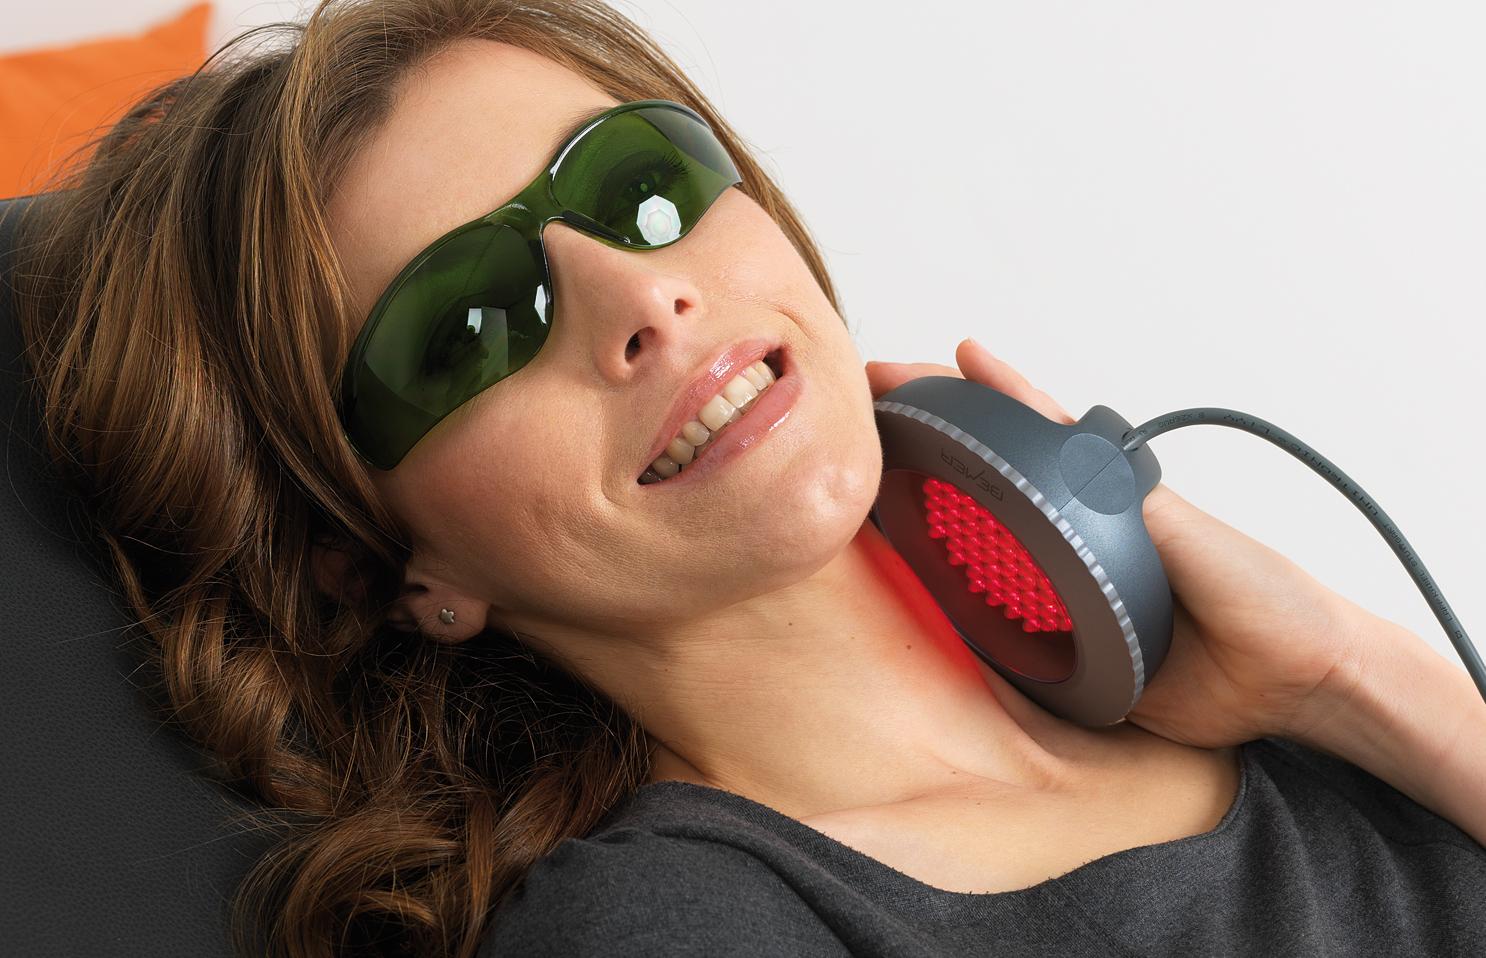 Light Treatment B Light Application Modules For Physical